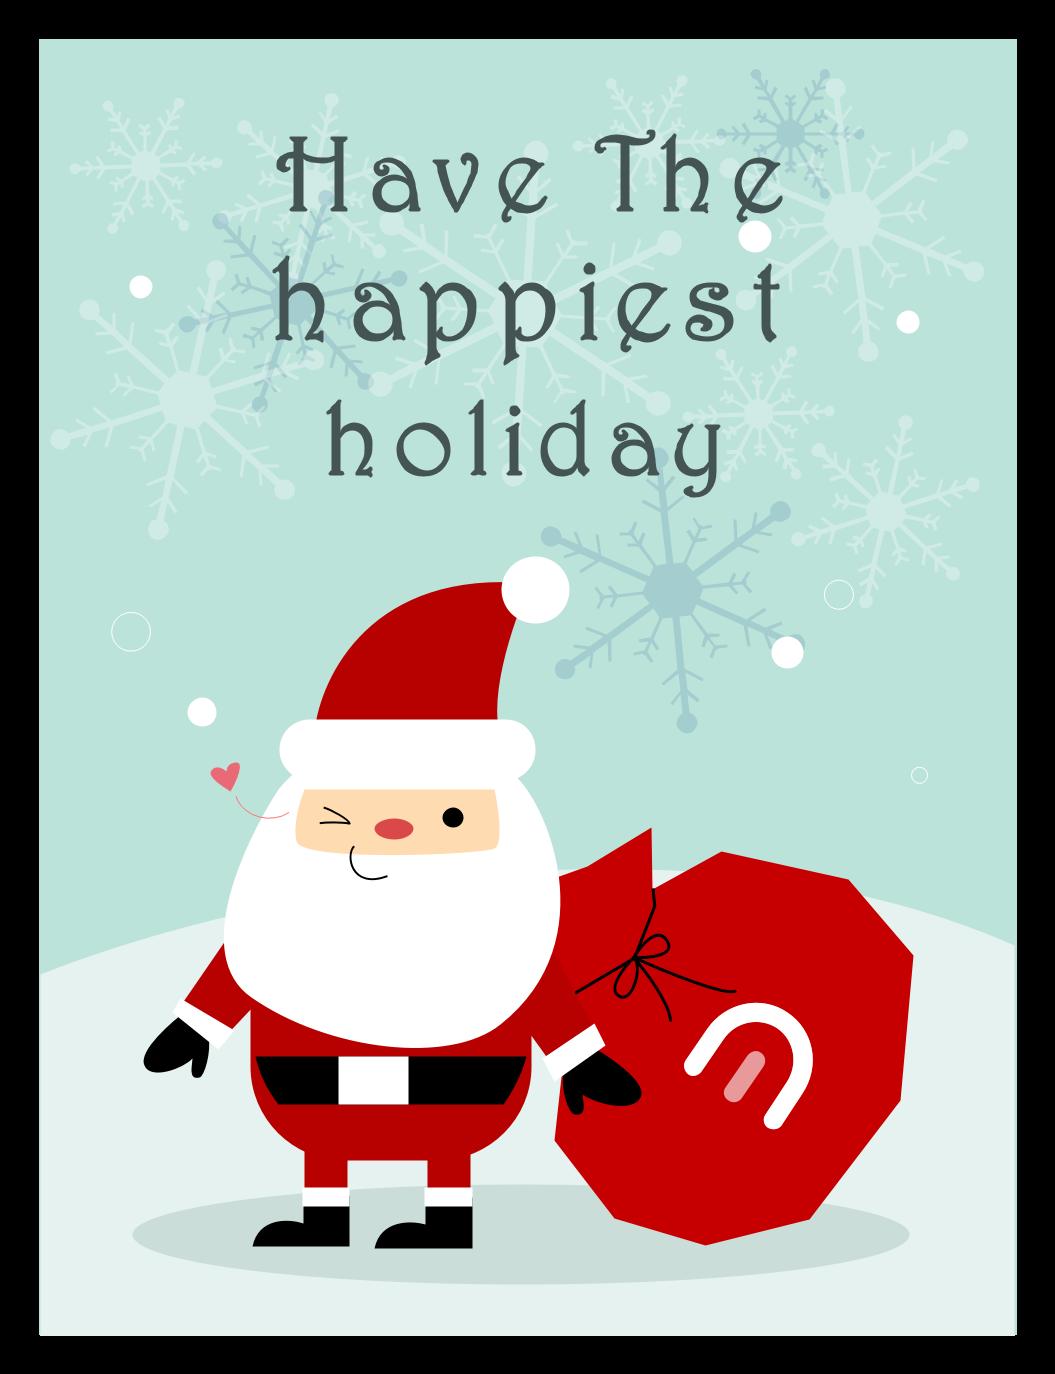 Funny Edraw Christmas Card Edrawmax Christmas Card Templates Free Funny Christmas Cards Christmas Cards